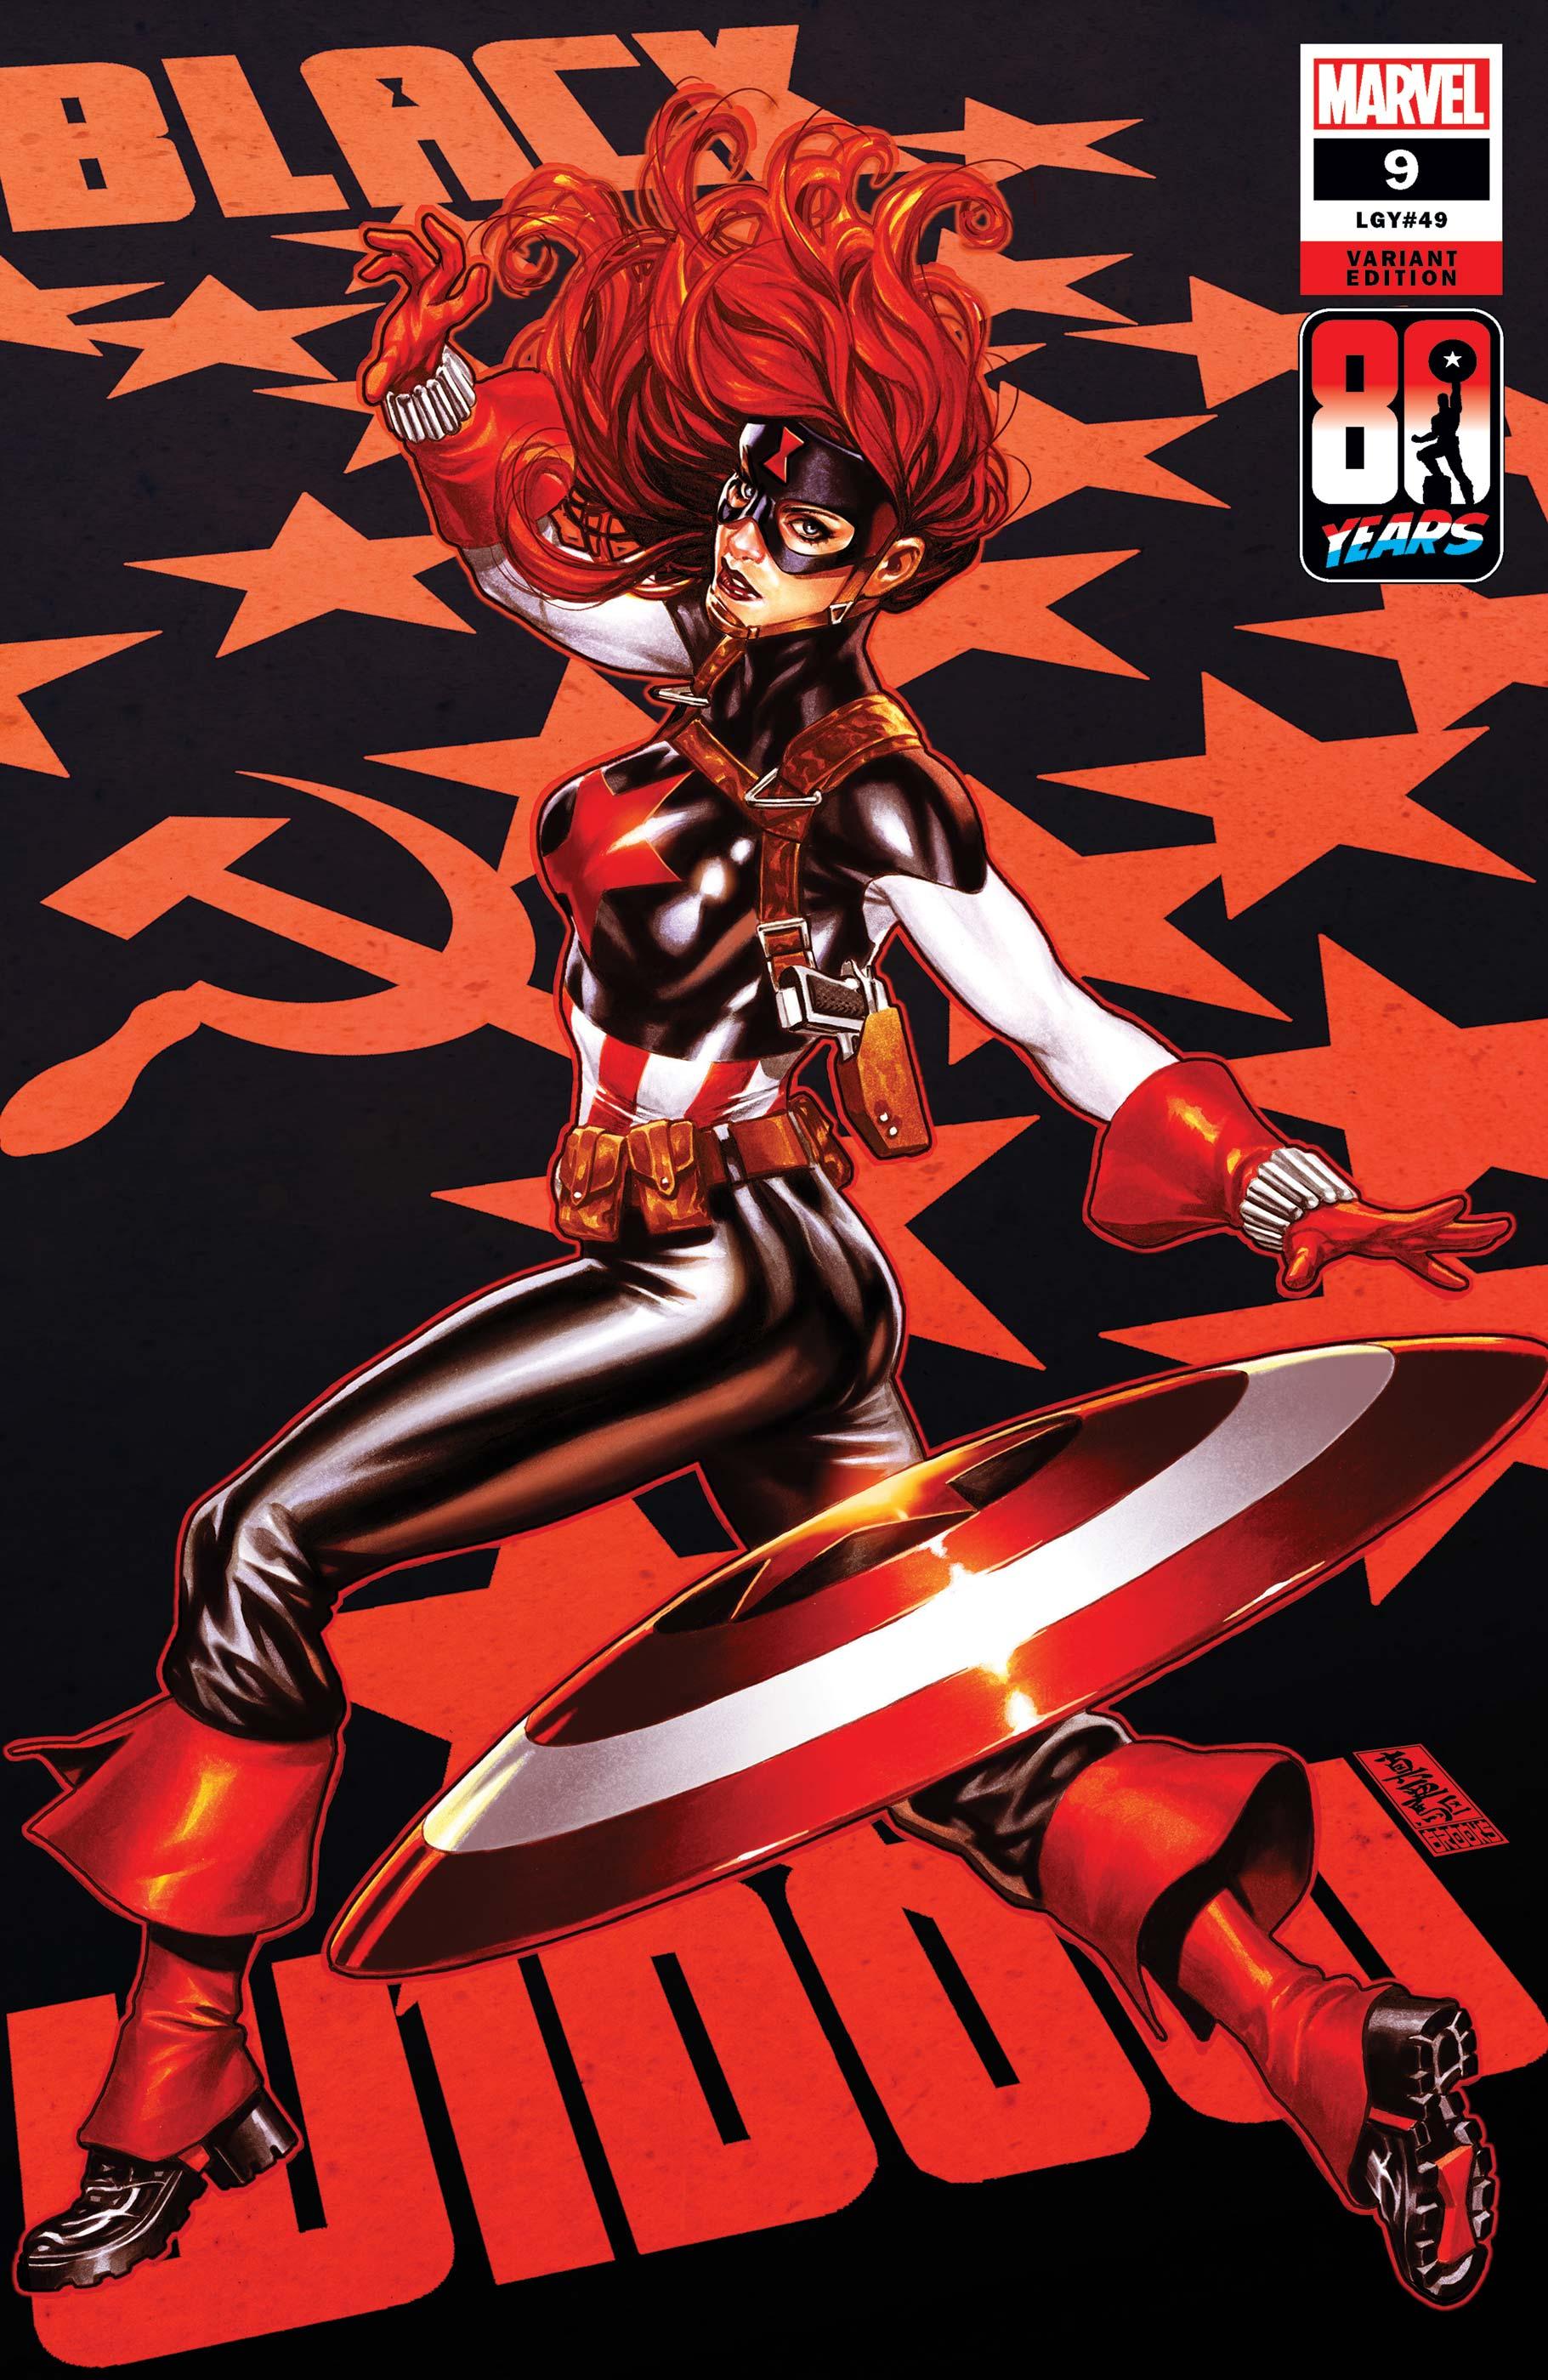 Black Widow (2020) #9 (Variant)